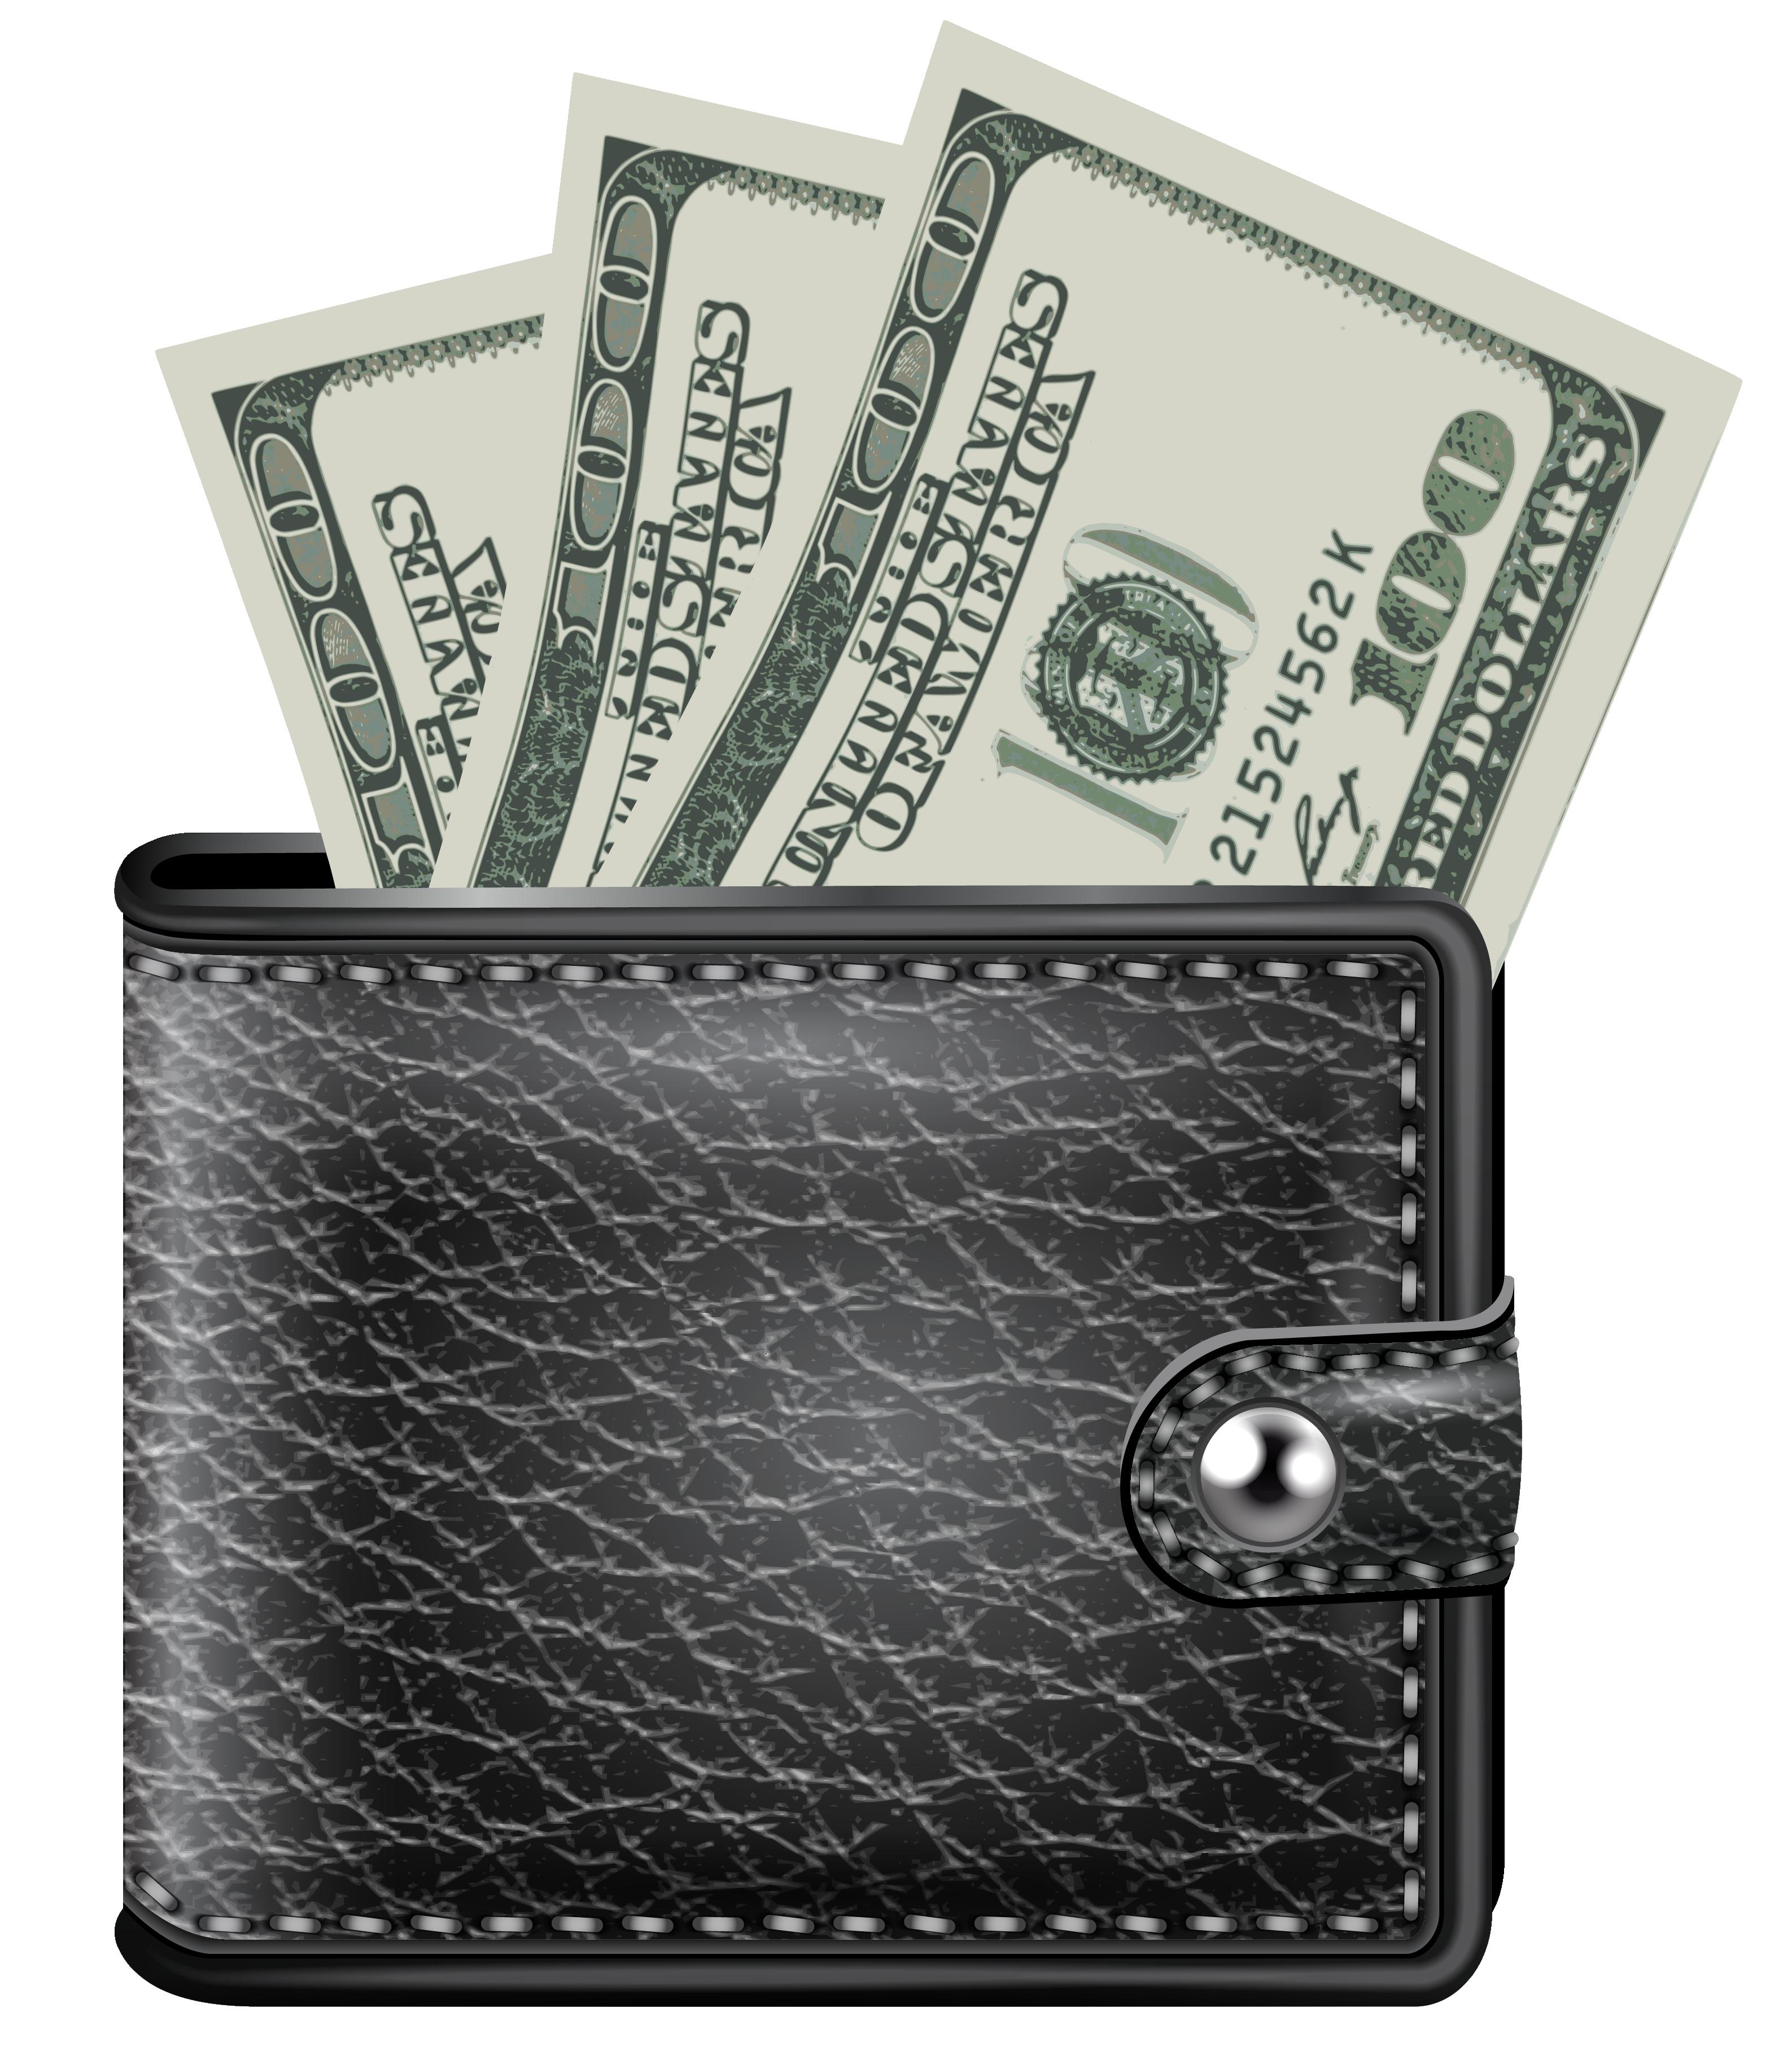 Purse Money Png Image - Money, Transparent background PNG HD thumbnail